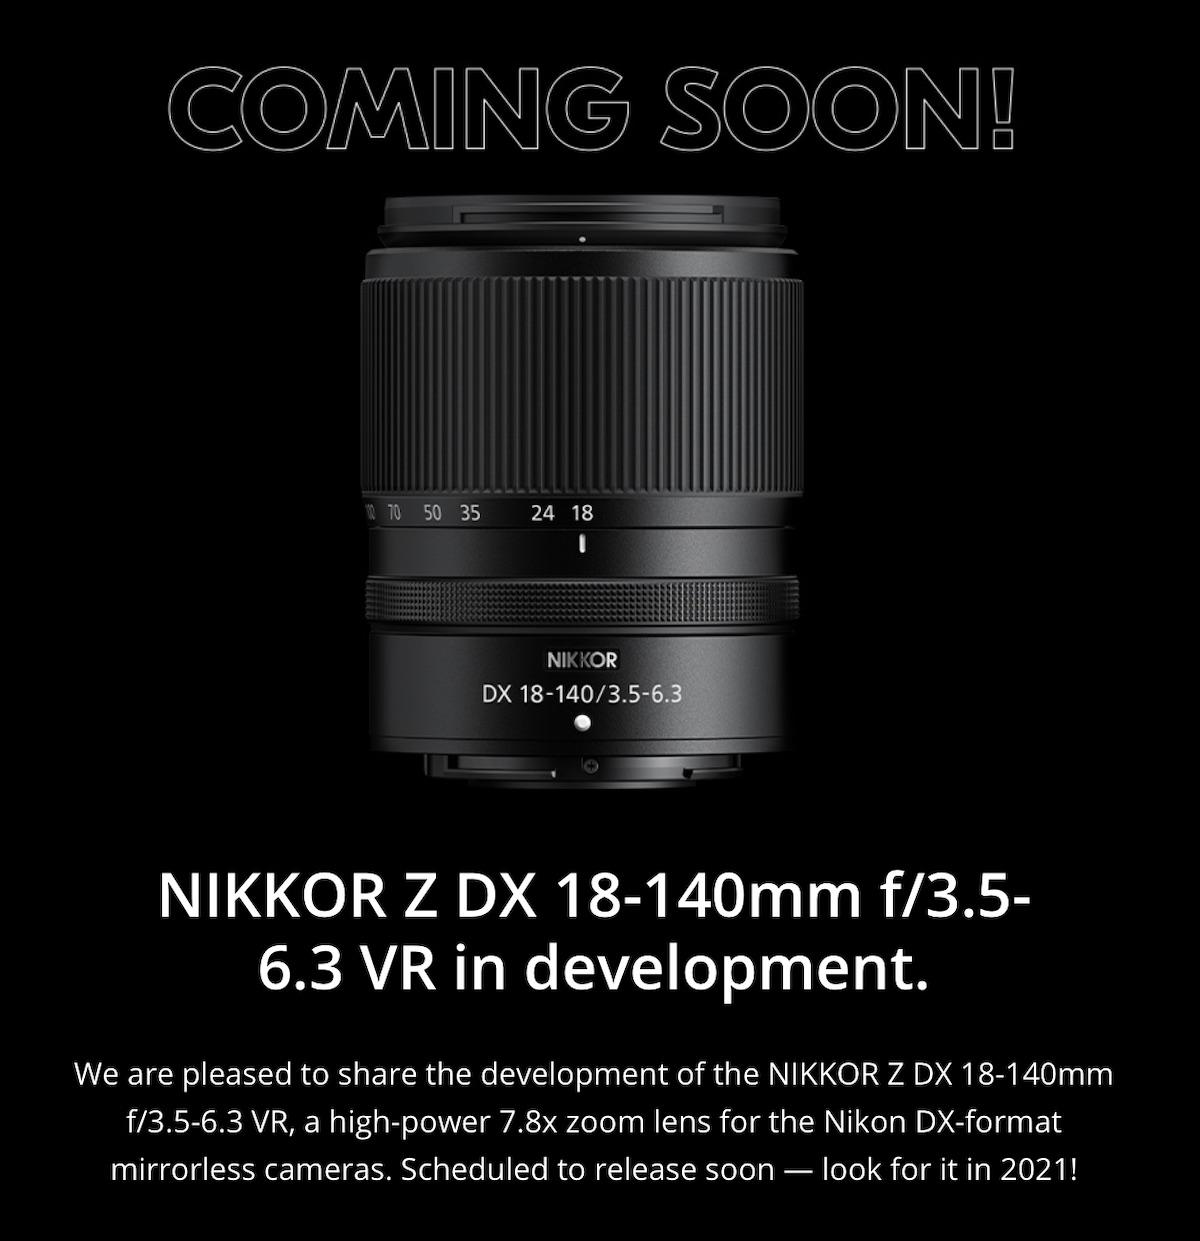 Il nuovo obiettivo Nikon NIKKOR Z DX 18-140mm f/3.5-6.3 VR